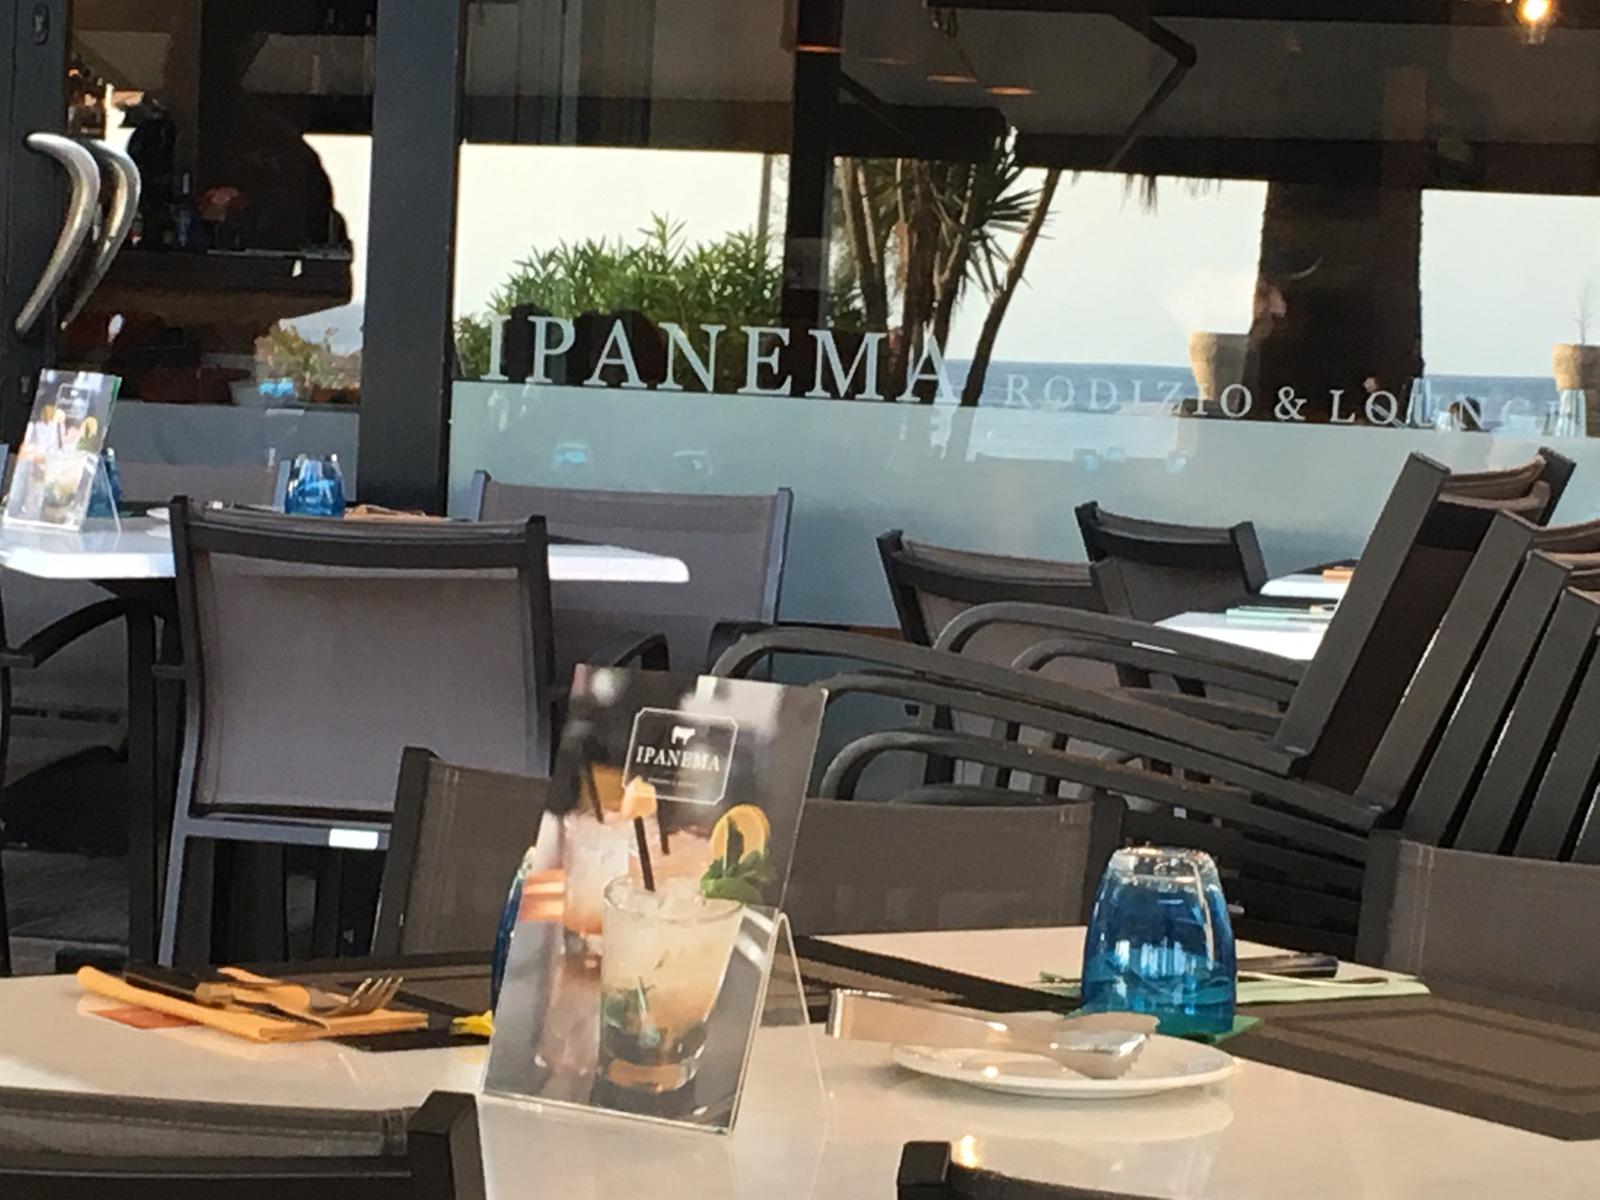 Restaurant Ipanema